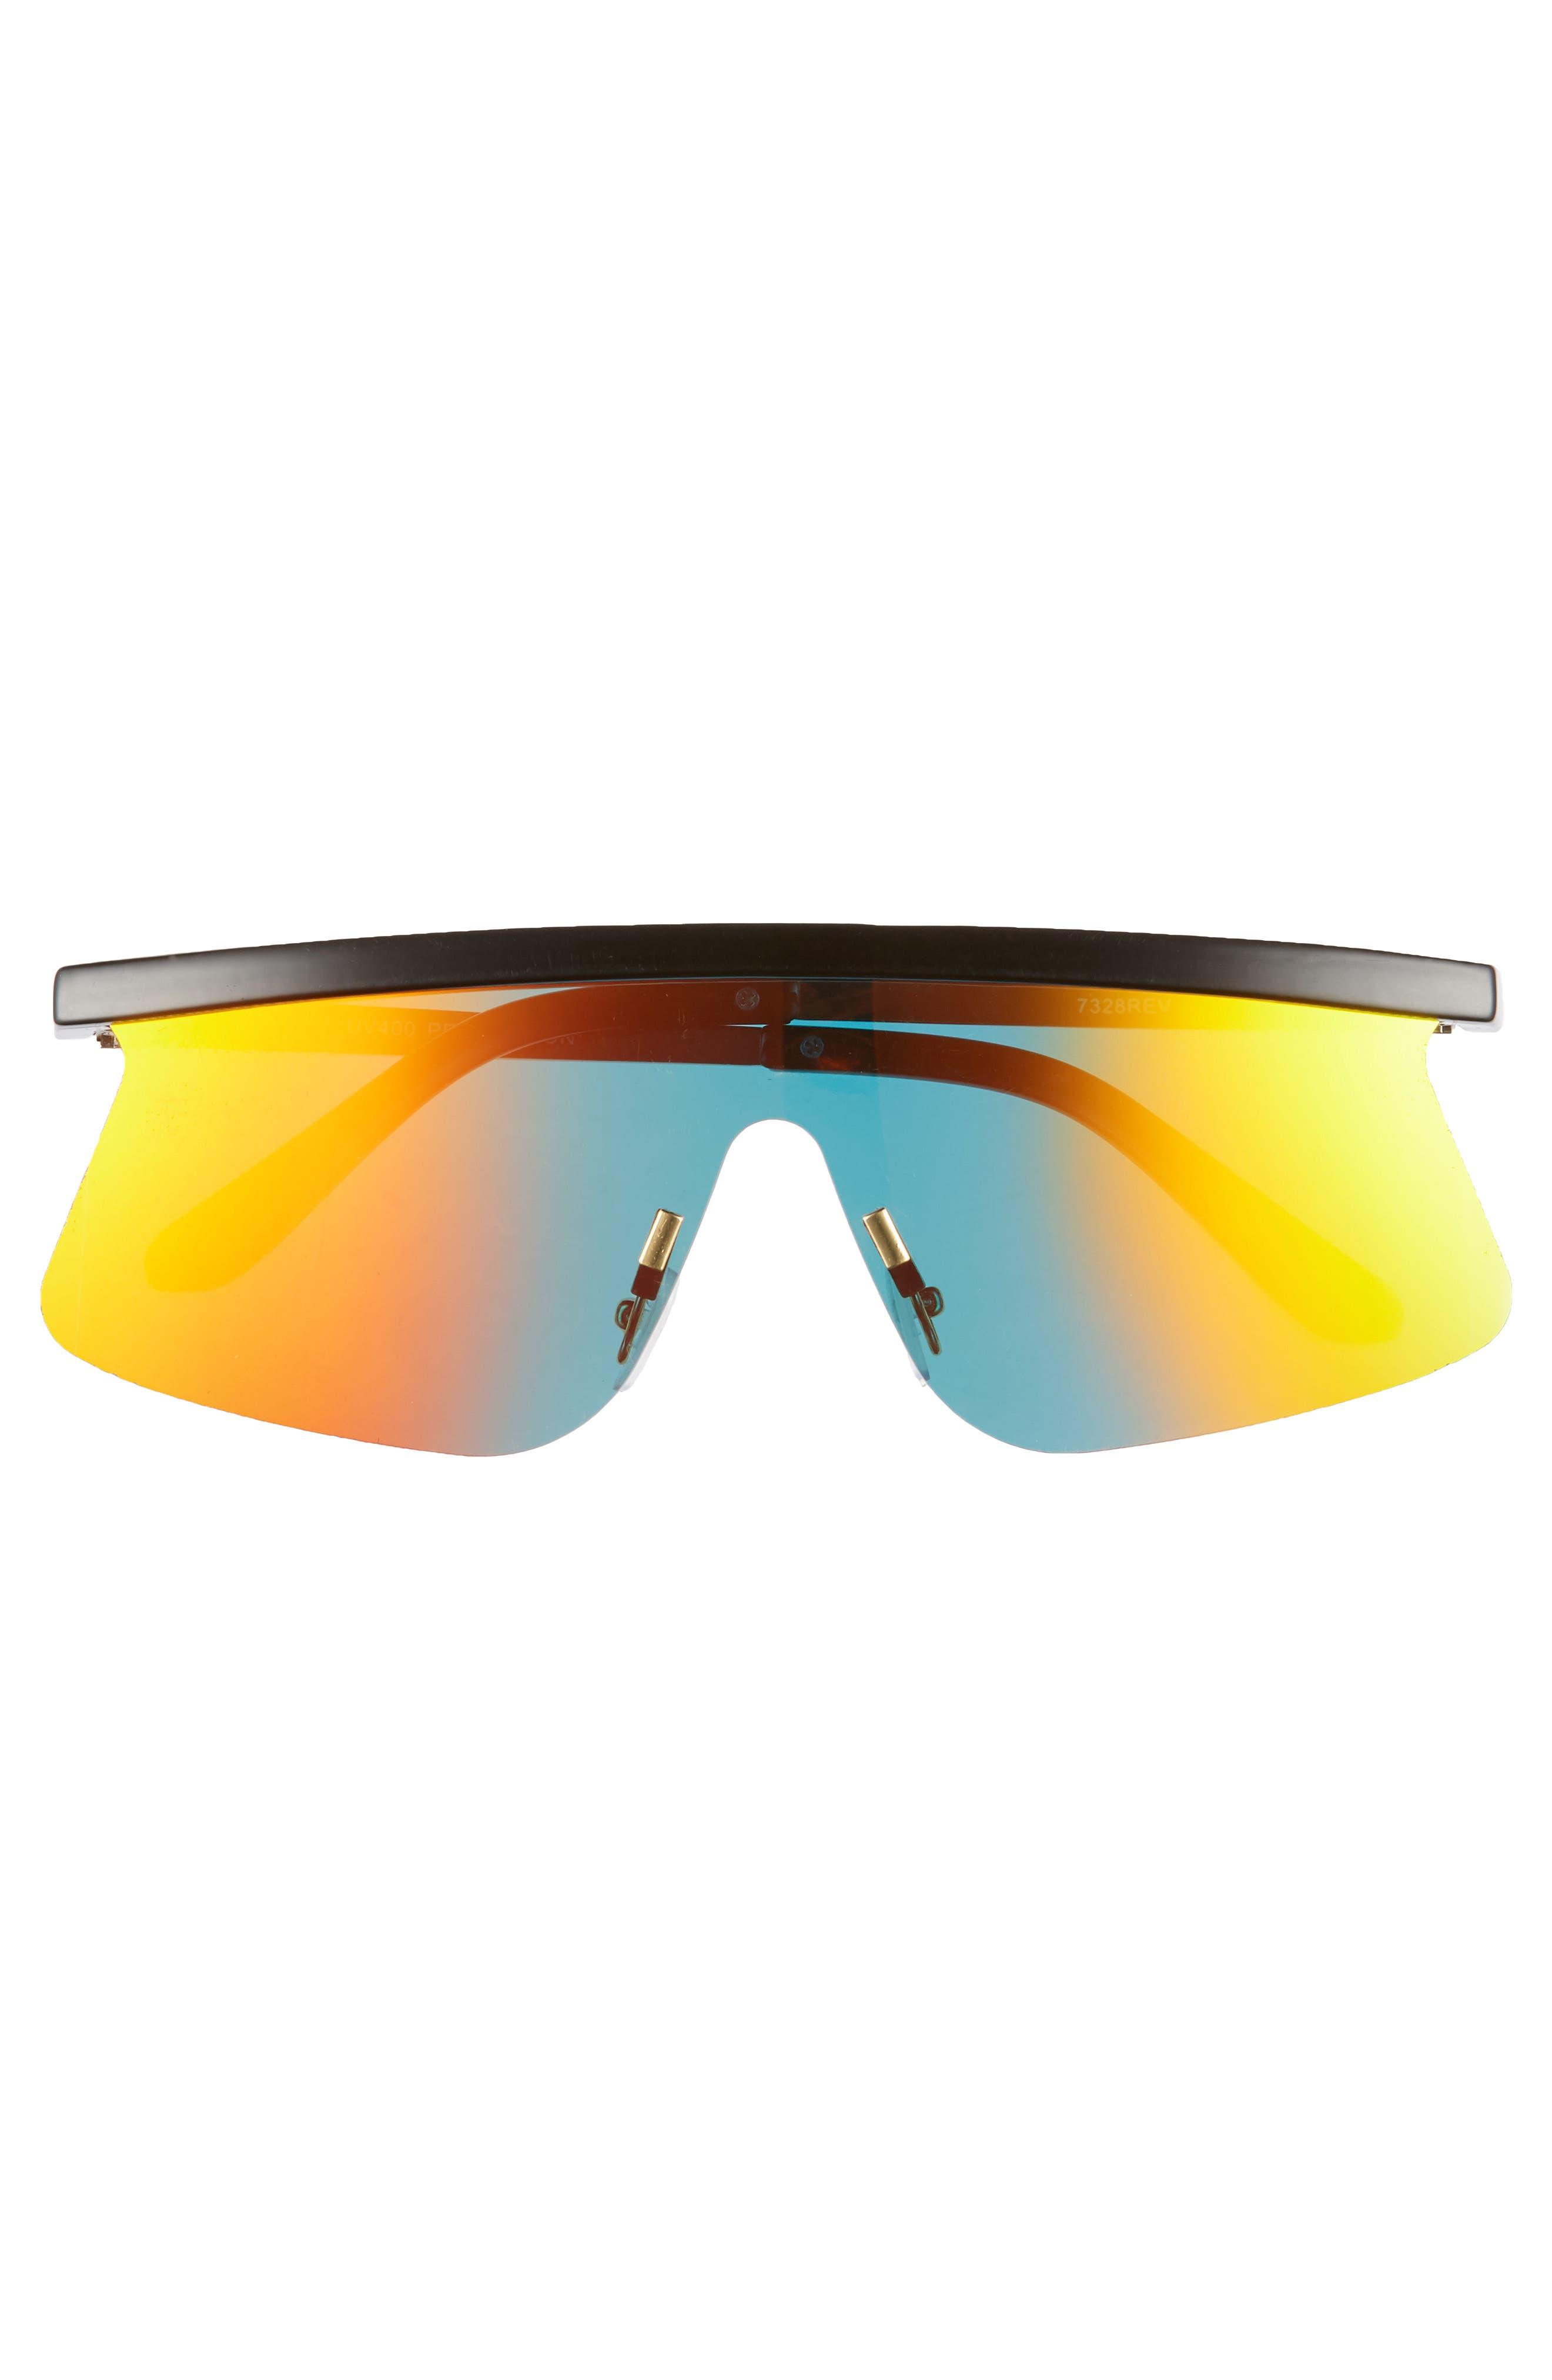 Brow Bar Shield Sunglasses,                             Alternate thumbnail 3, color,                             BLACK/ ORANGE